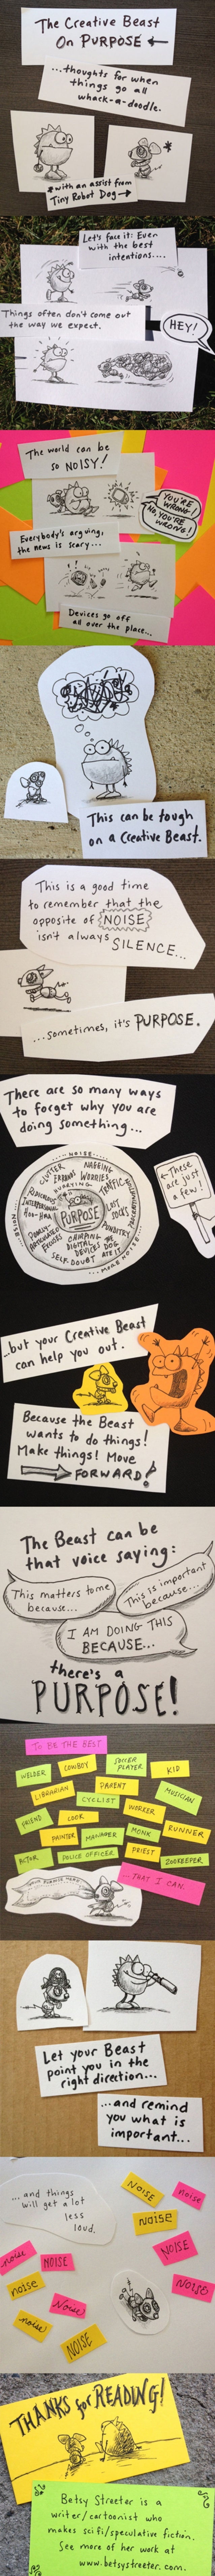 The Creative Beast On Purpose